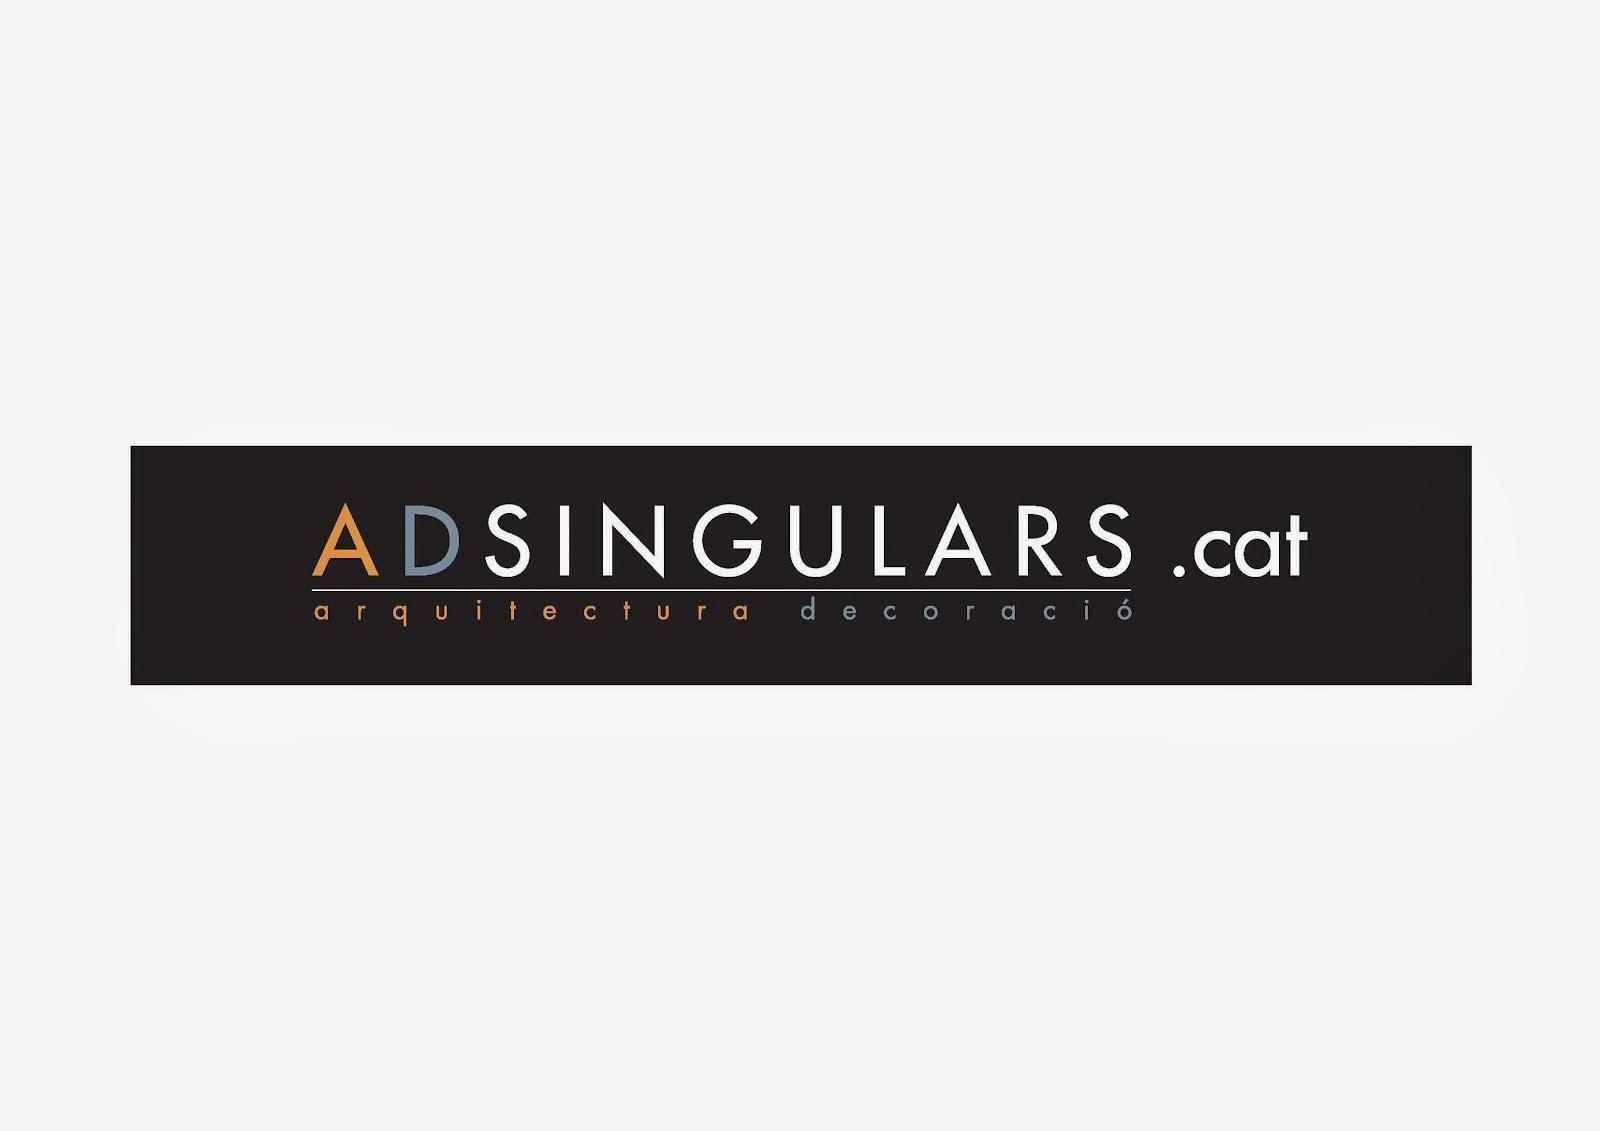 ADSINGULARS.cat